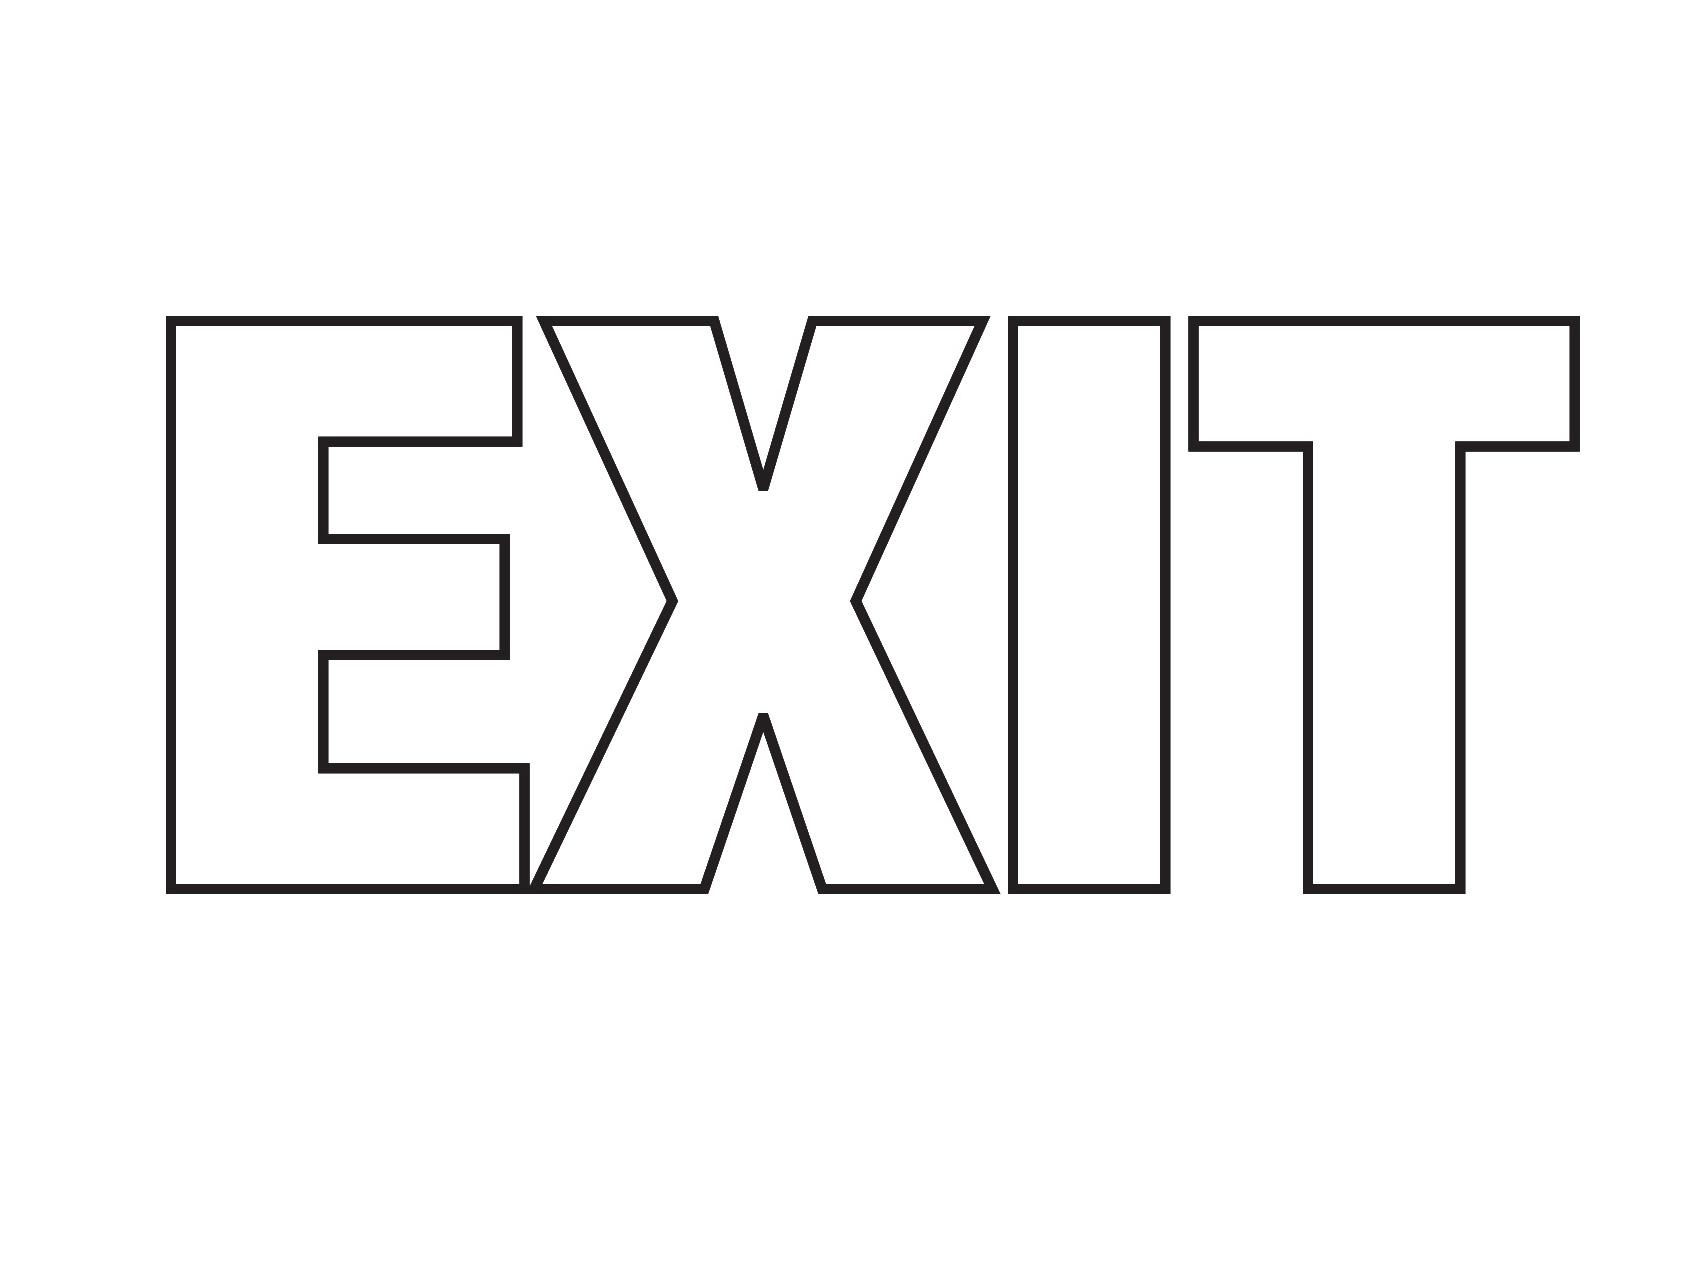 exit-18x24a.jpg